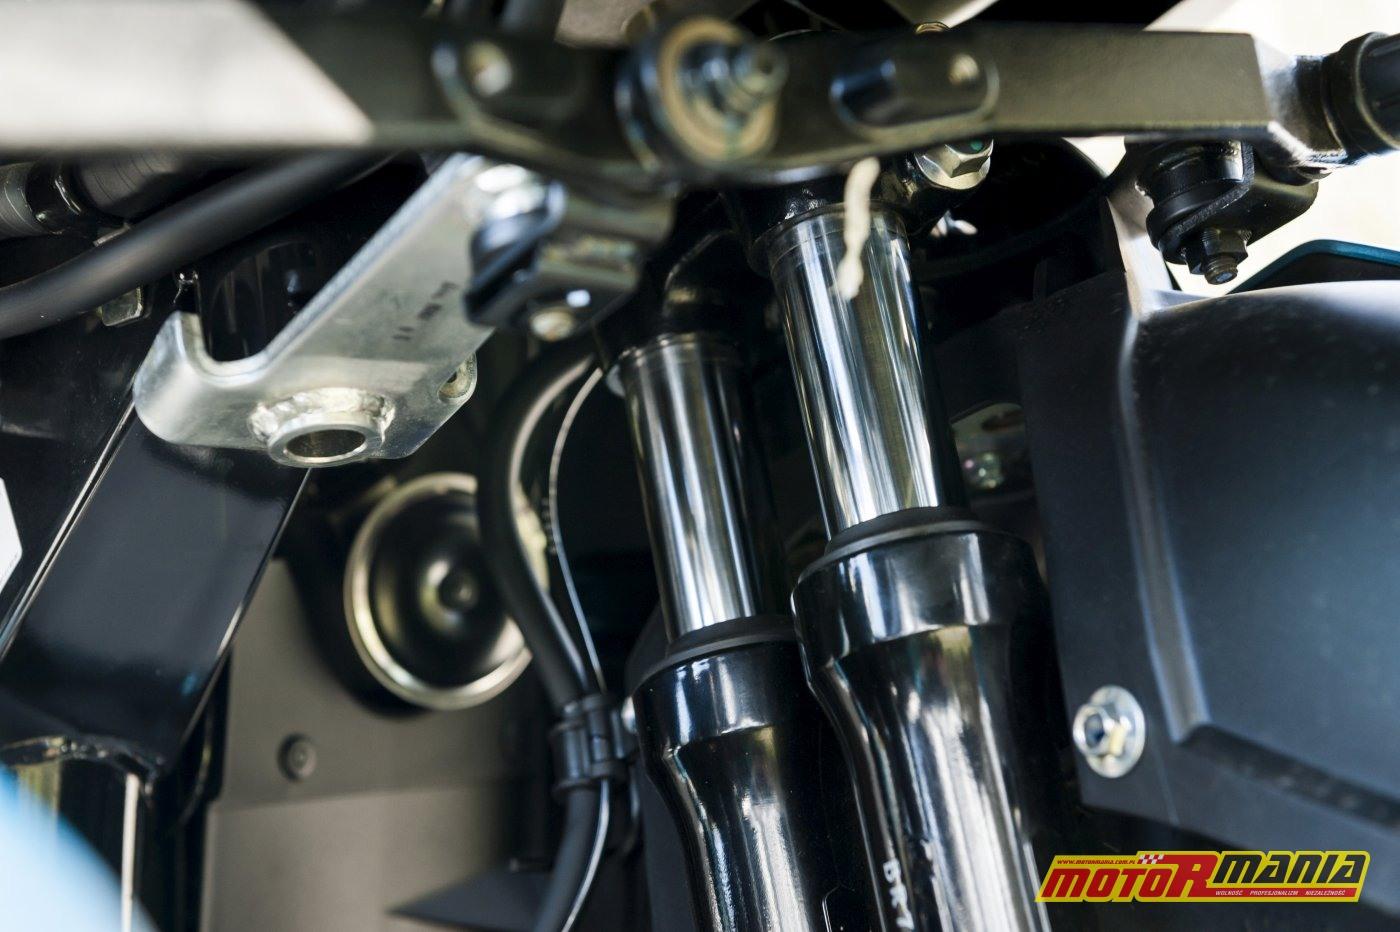 Yamaha Tricity 125 test motormania - fot Tomazi_pl (9)